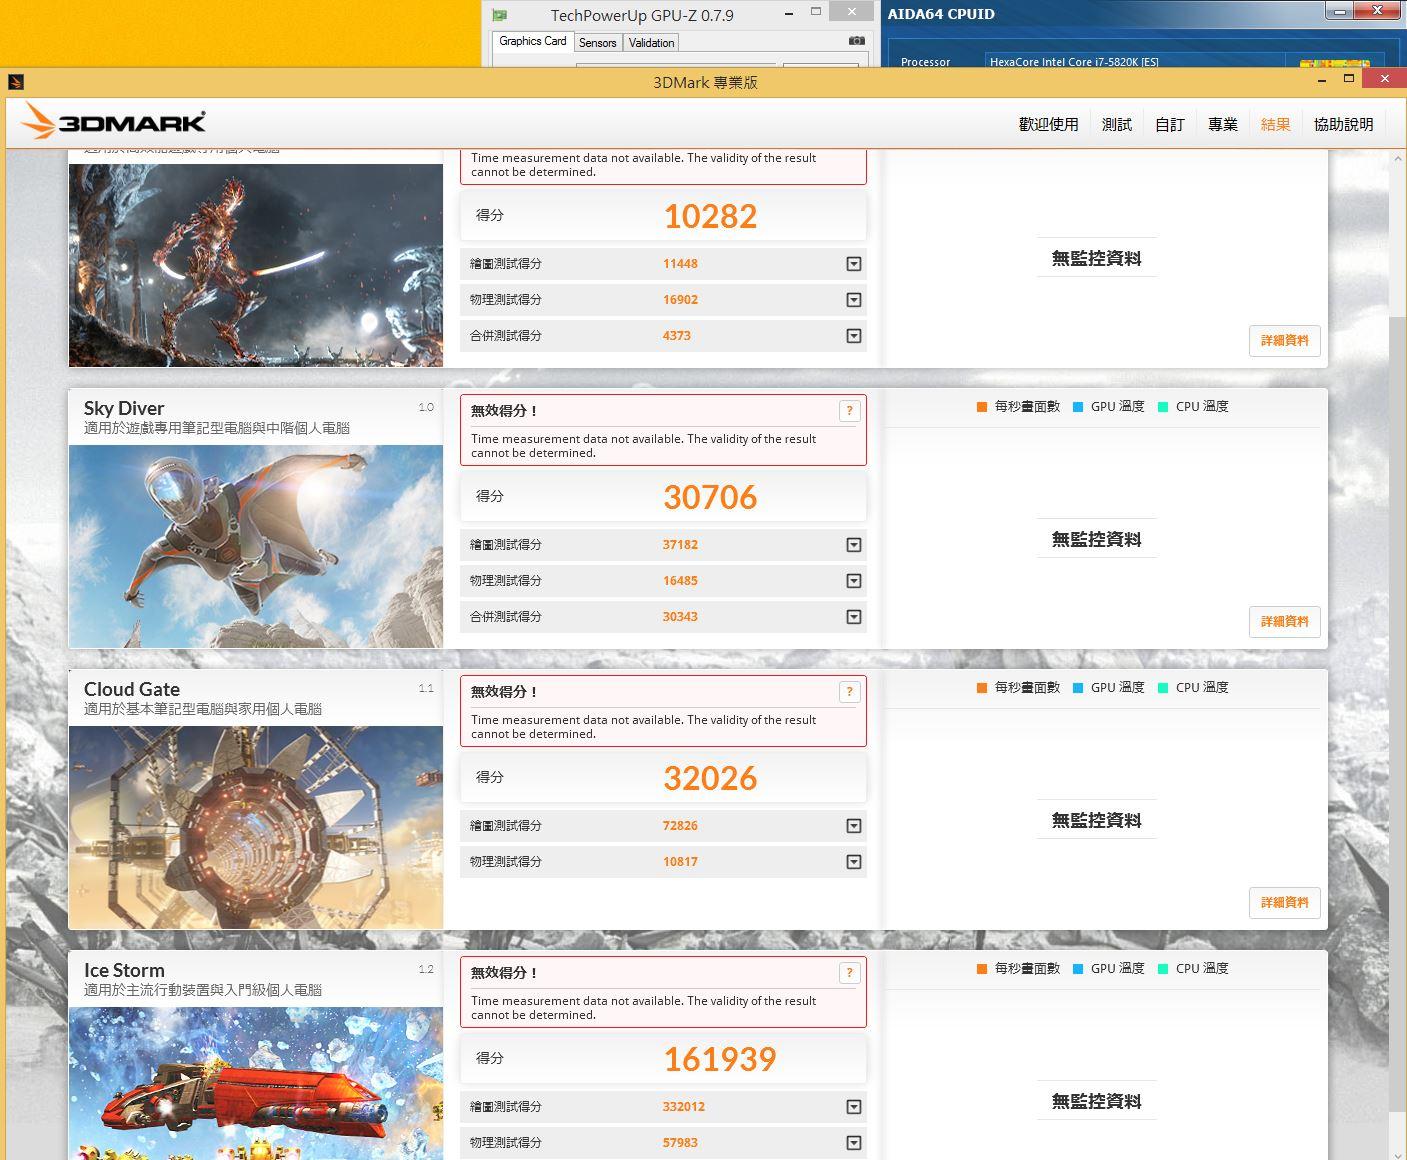 [XF] 引頸期盼X99 實惠6核新契機Intel Corei7-5820K評測